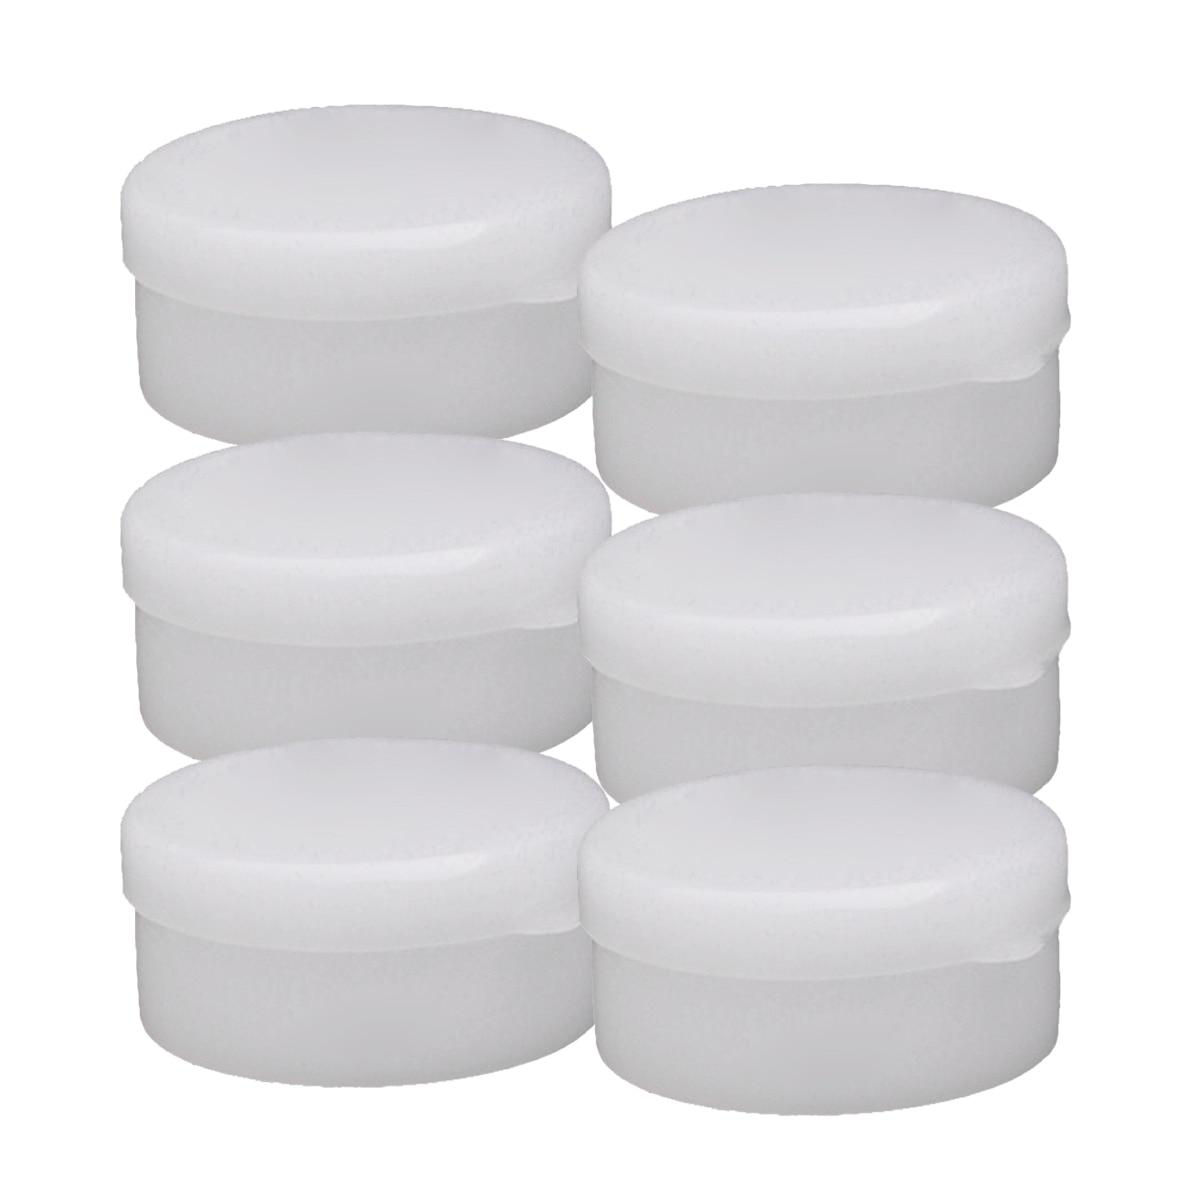 HHFF 100 stücke Gesicht Creme Box Kosmetik Unter abfüllung (30g (4,80*4,50*2,20 cm ))